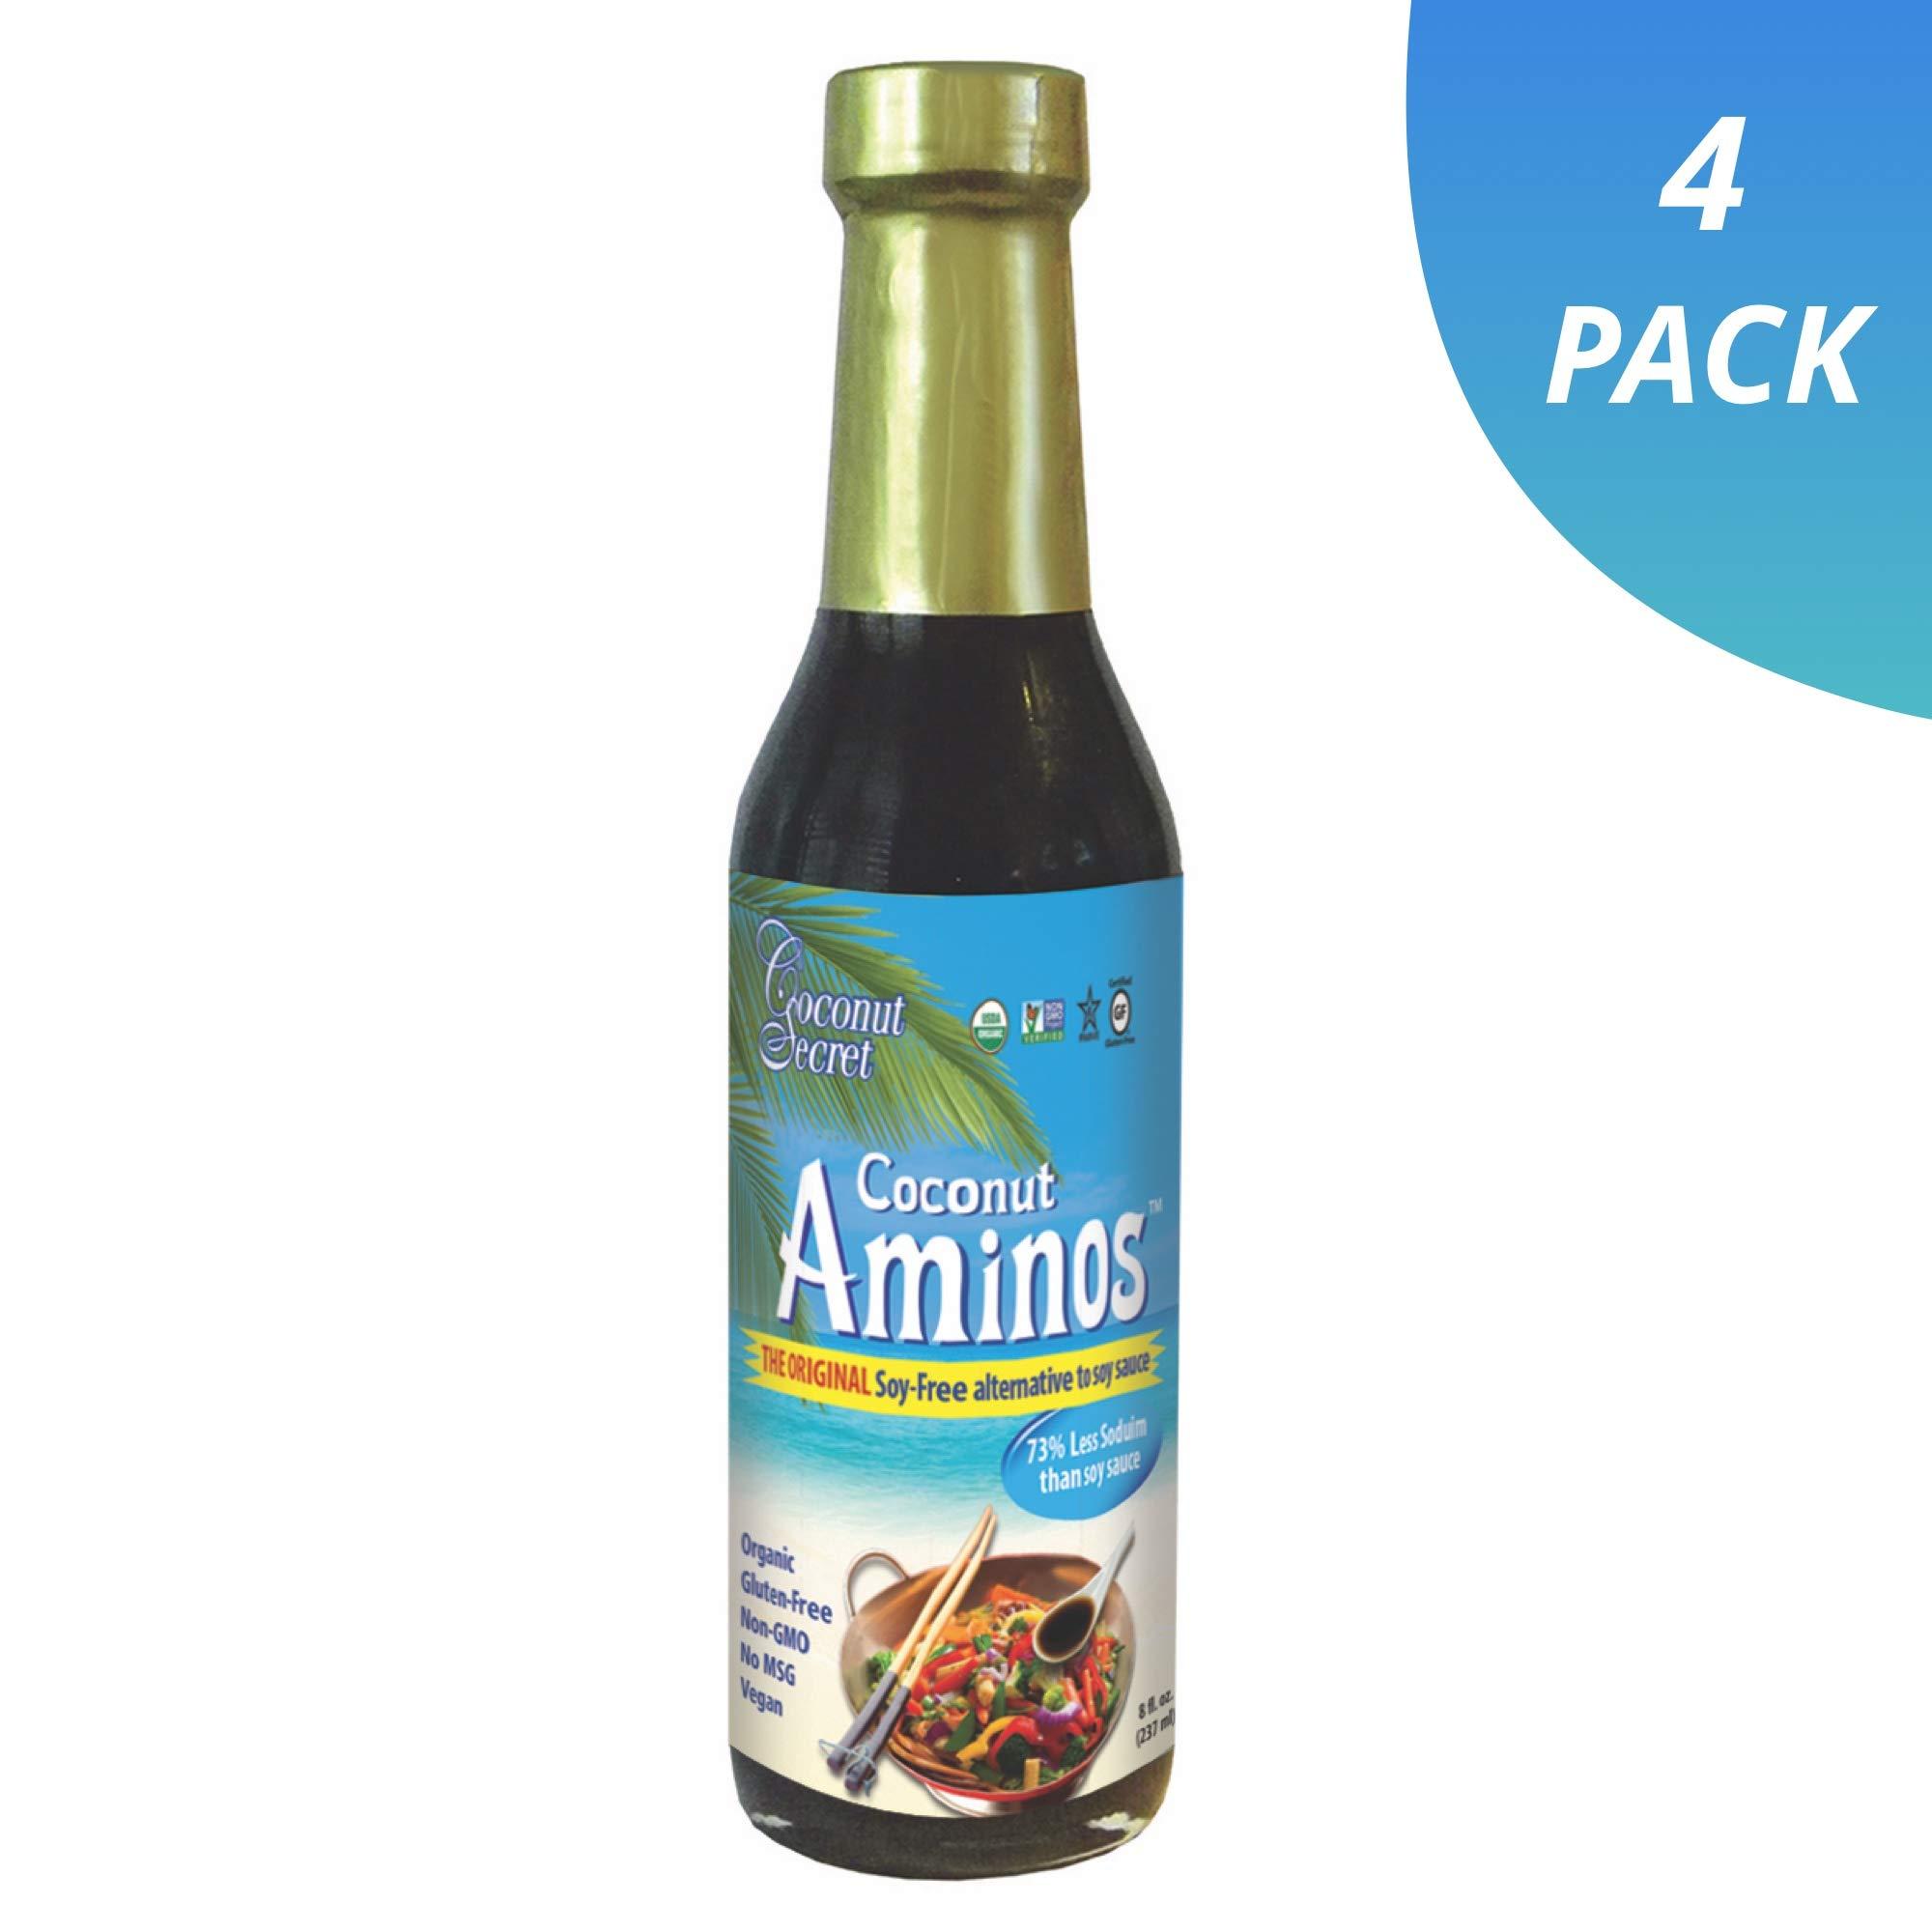 Coconut Secret Coconut Aminos (12 Pack) - 8 fl oz - Low Sodium Soy Sauce Alternative, Low-Glycemic - Organic, Vegan, Non-GMO, Gluten-Free, Kosher - Keto, Paleo - 576 Total Servings by COCONUT SECRET